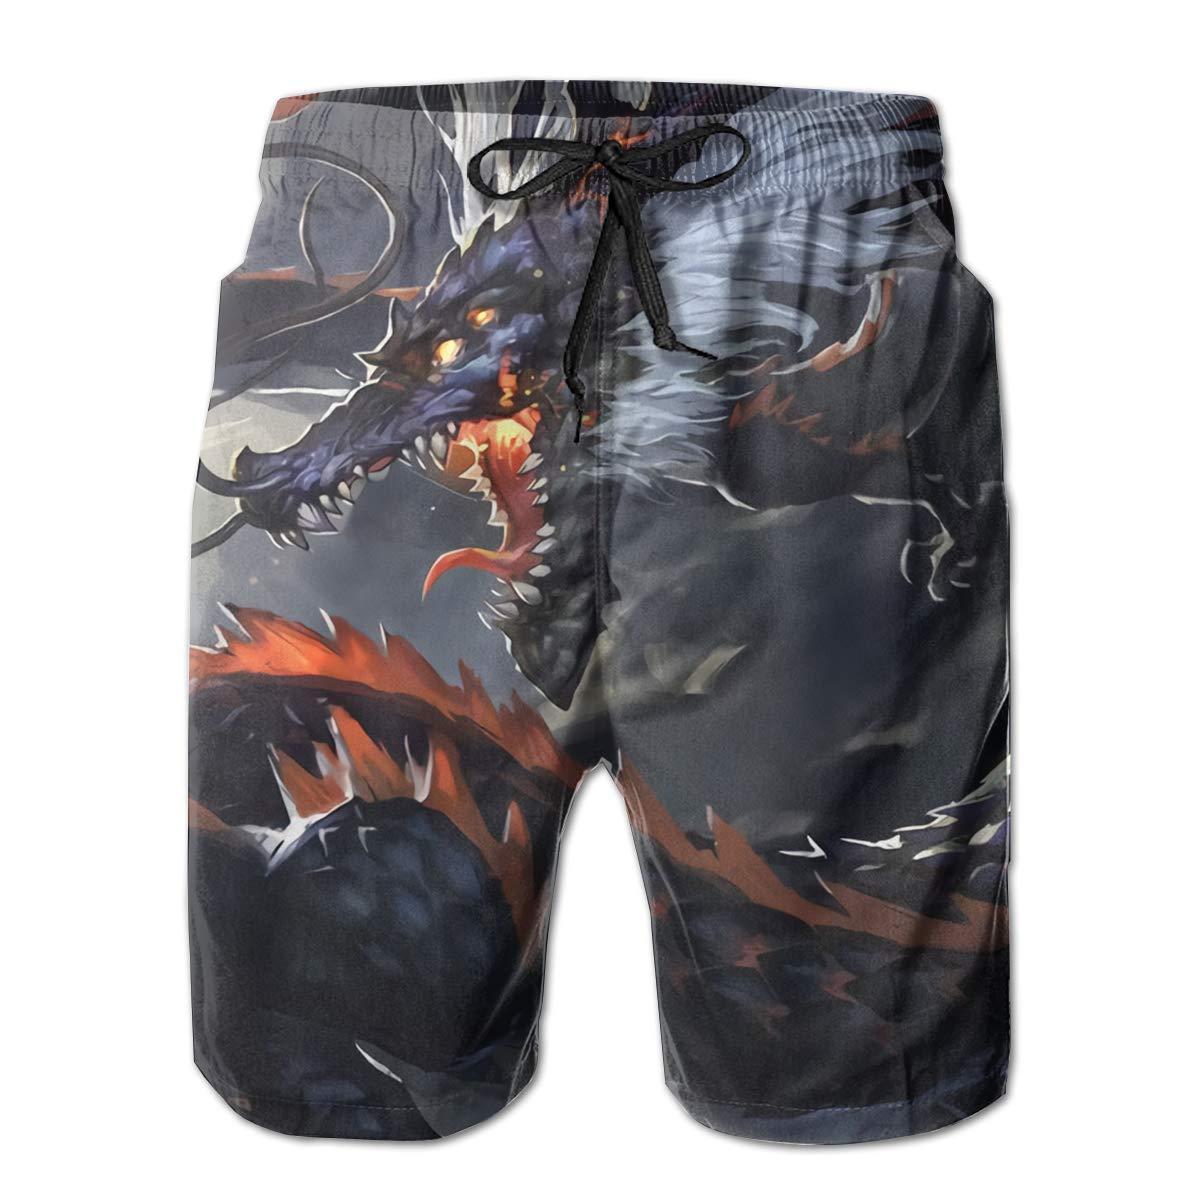 Black Dragon Mens Slim Fit Ultra Quick Dry Board Shorts Swim Trunks,Best Board Shorts for Sports Running